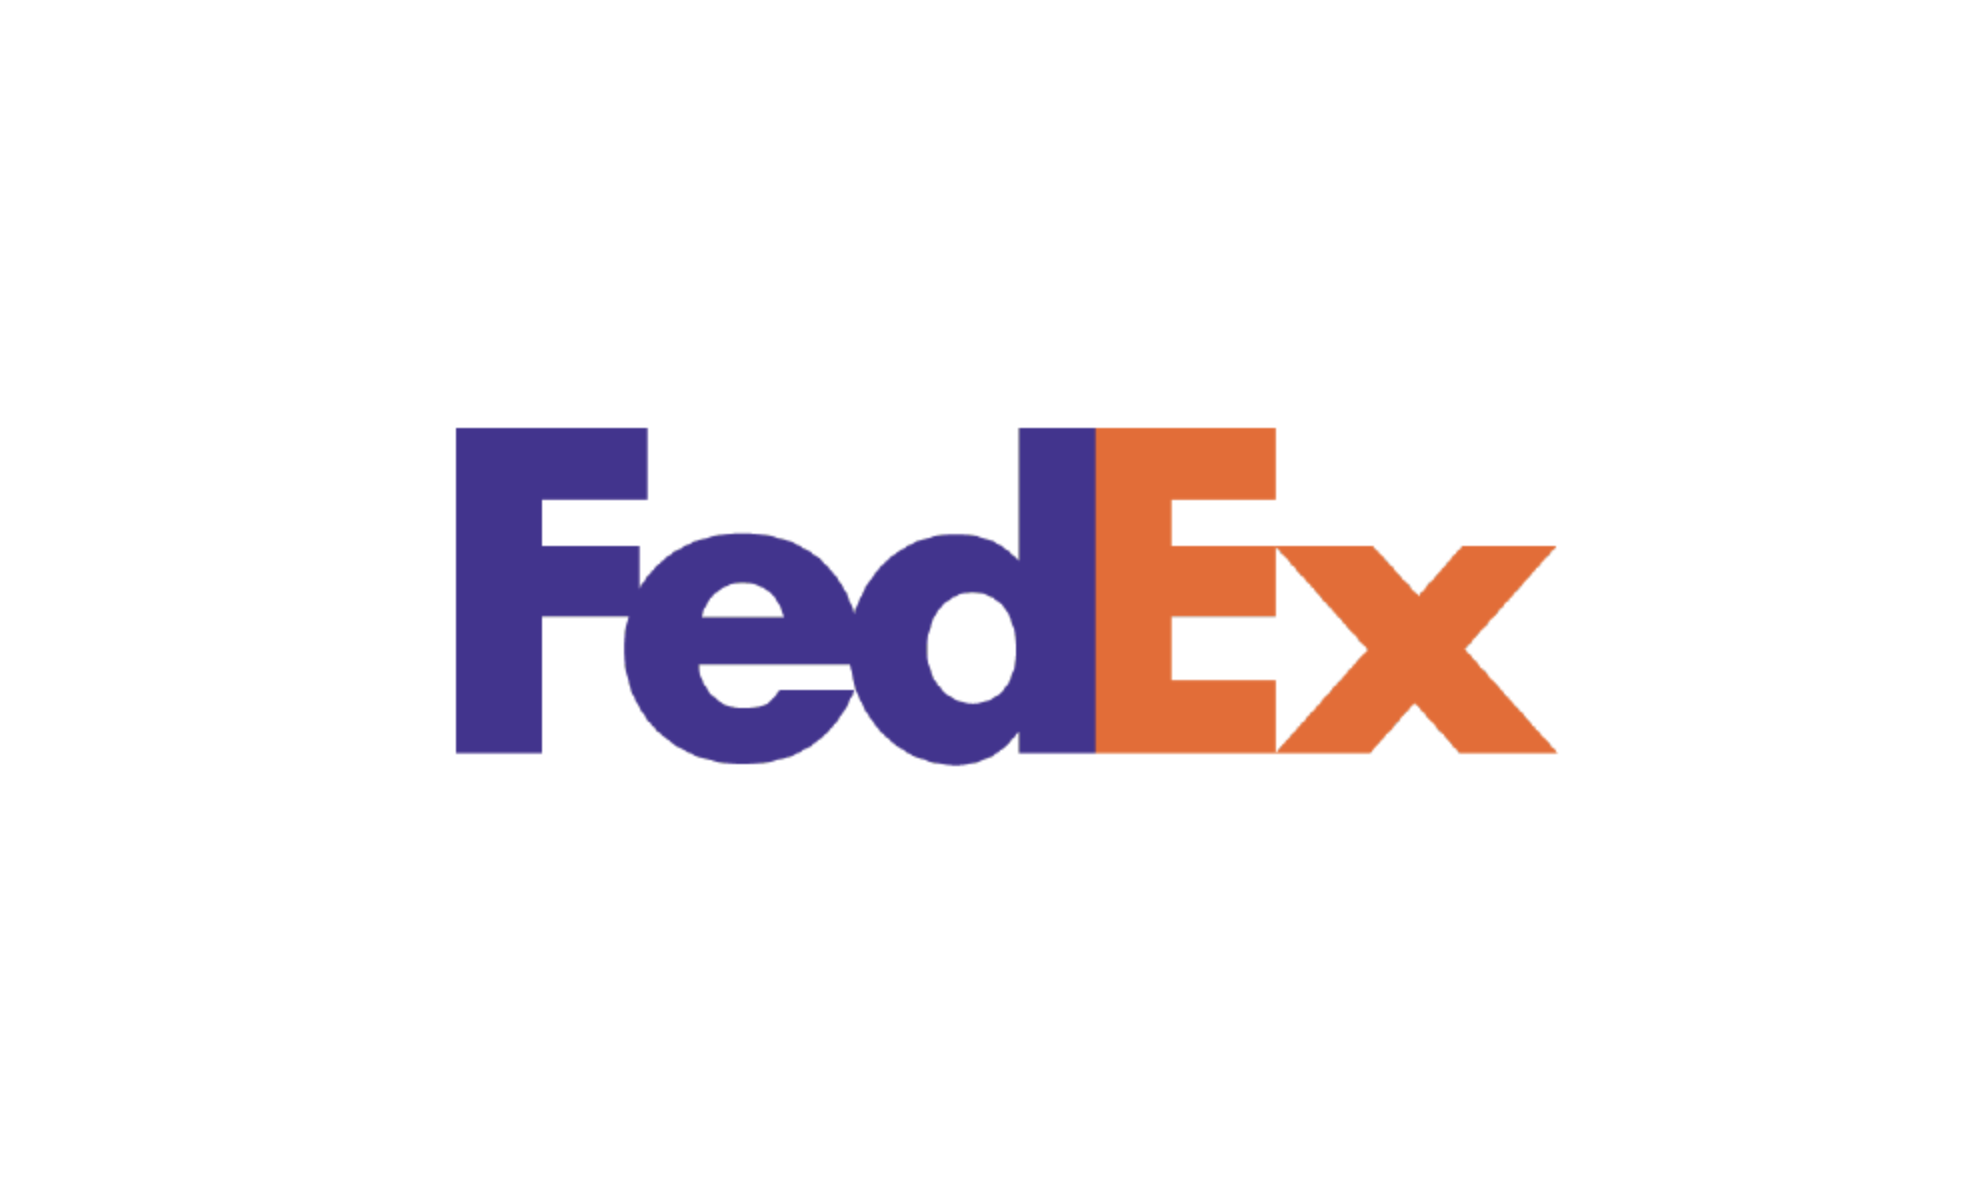 Wordmark Logo Design Example